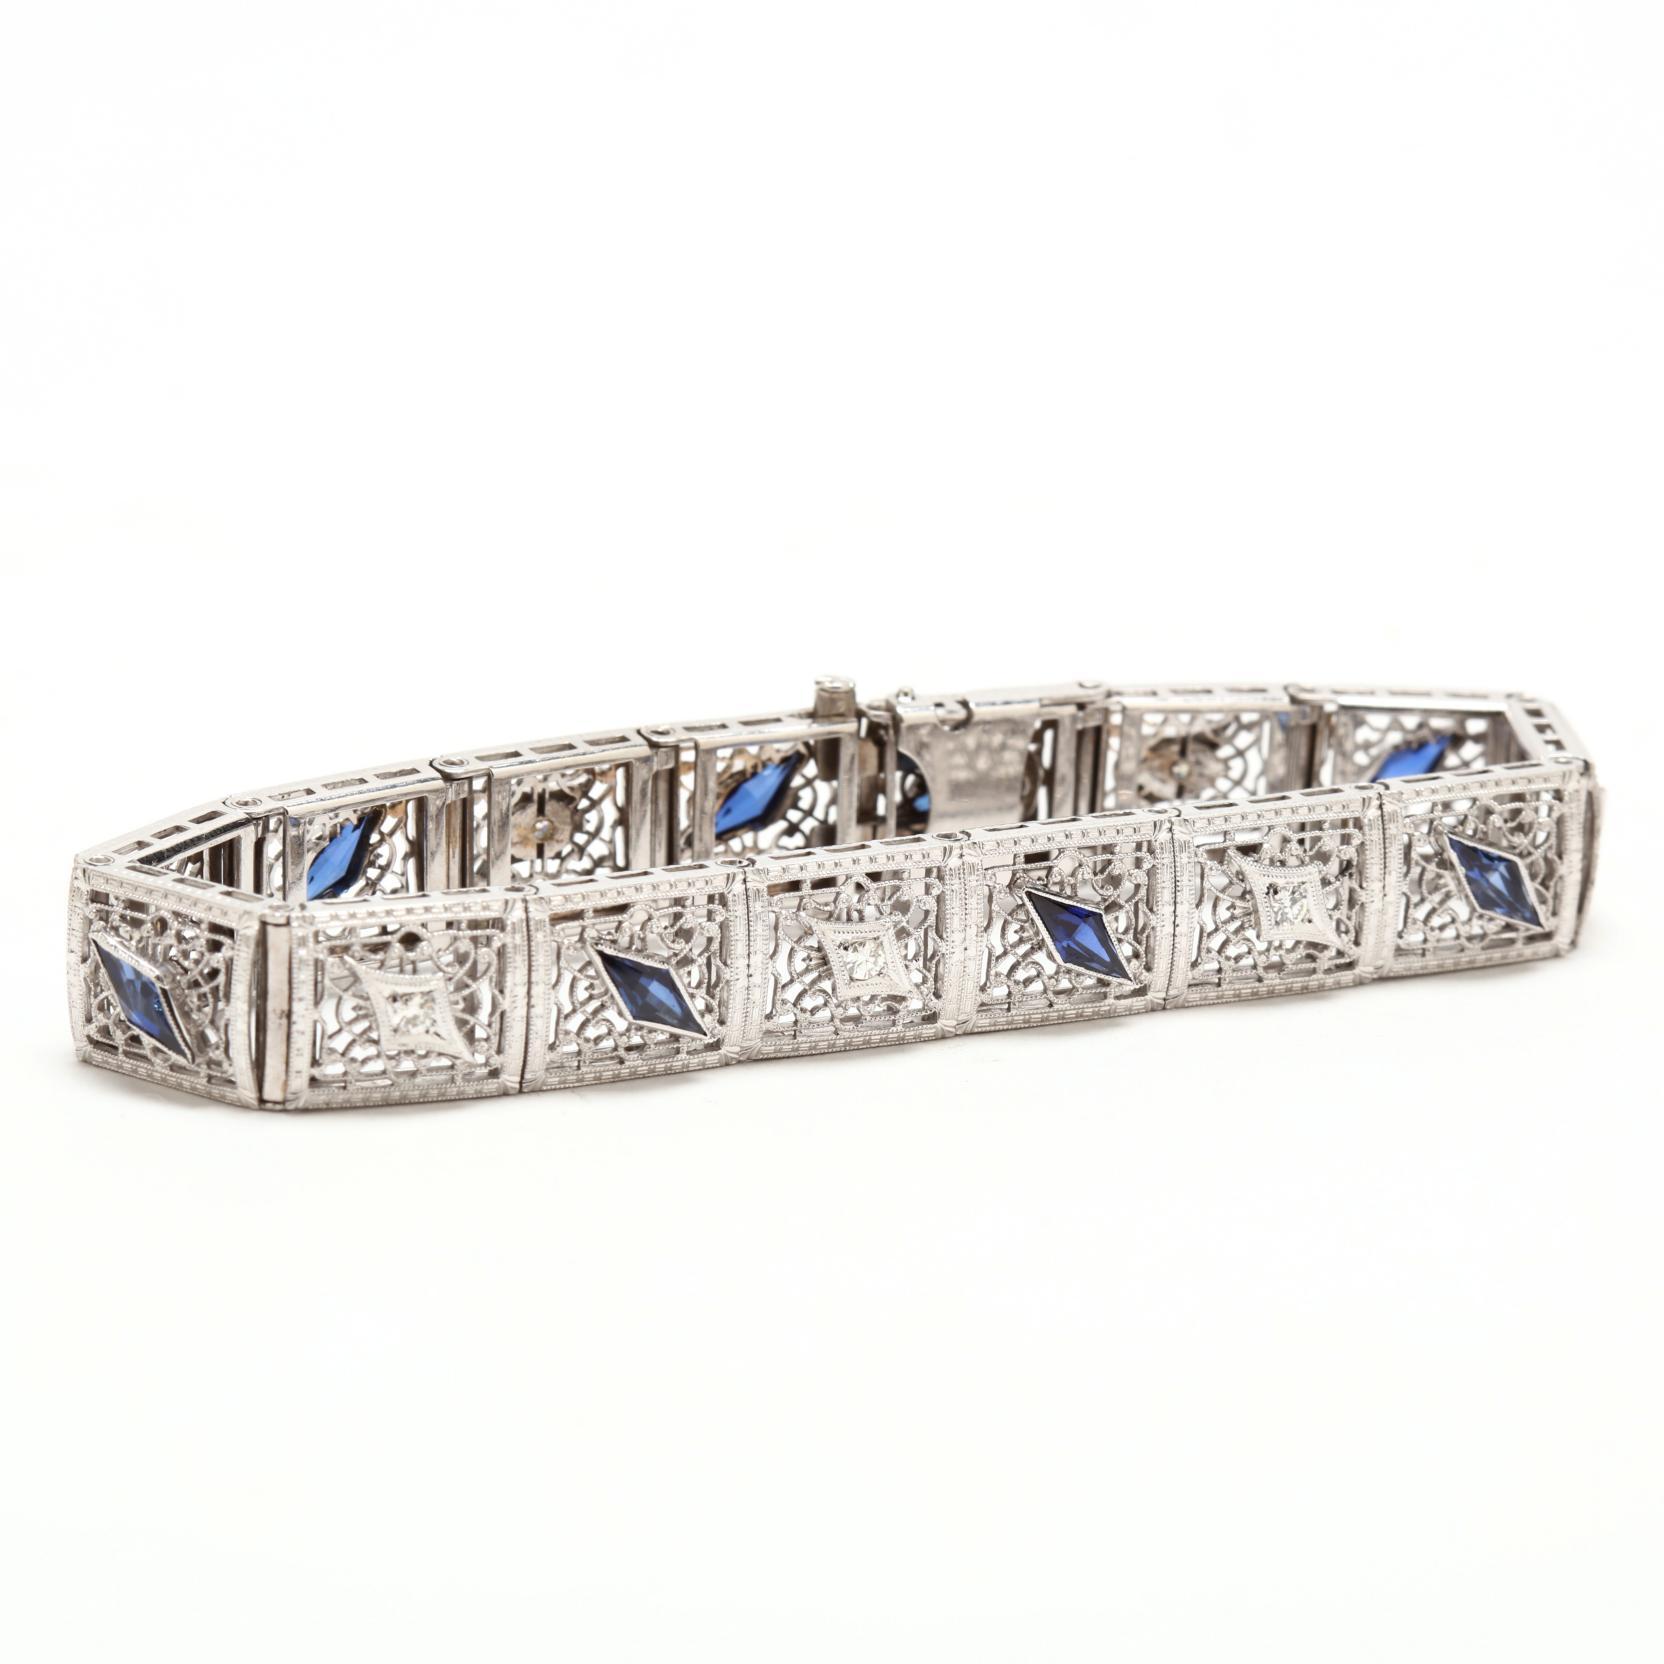 14kt-white-gold-diamond-and-sapphire-bracelet